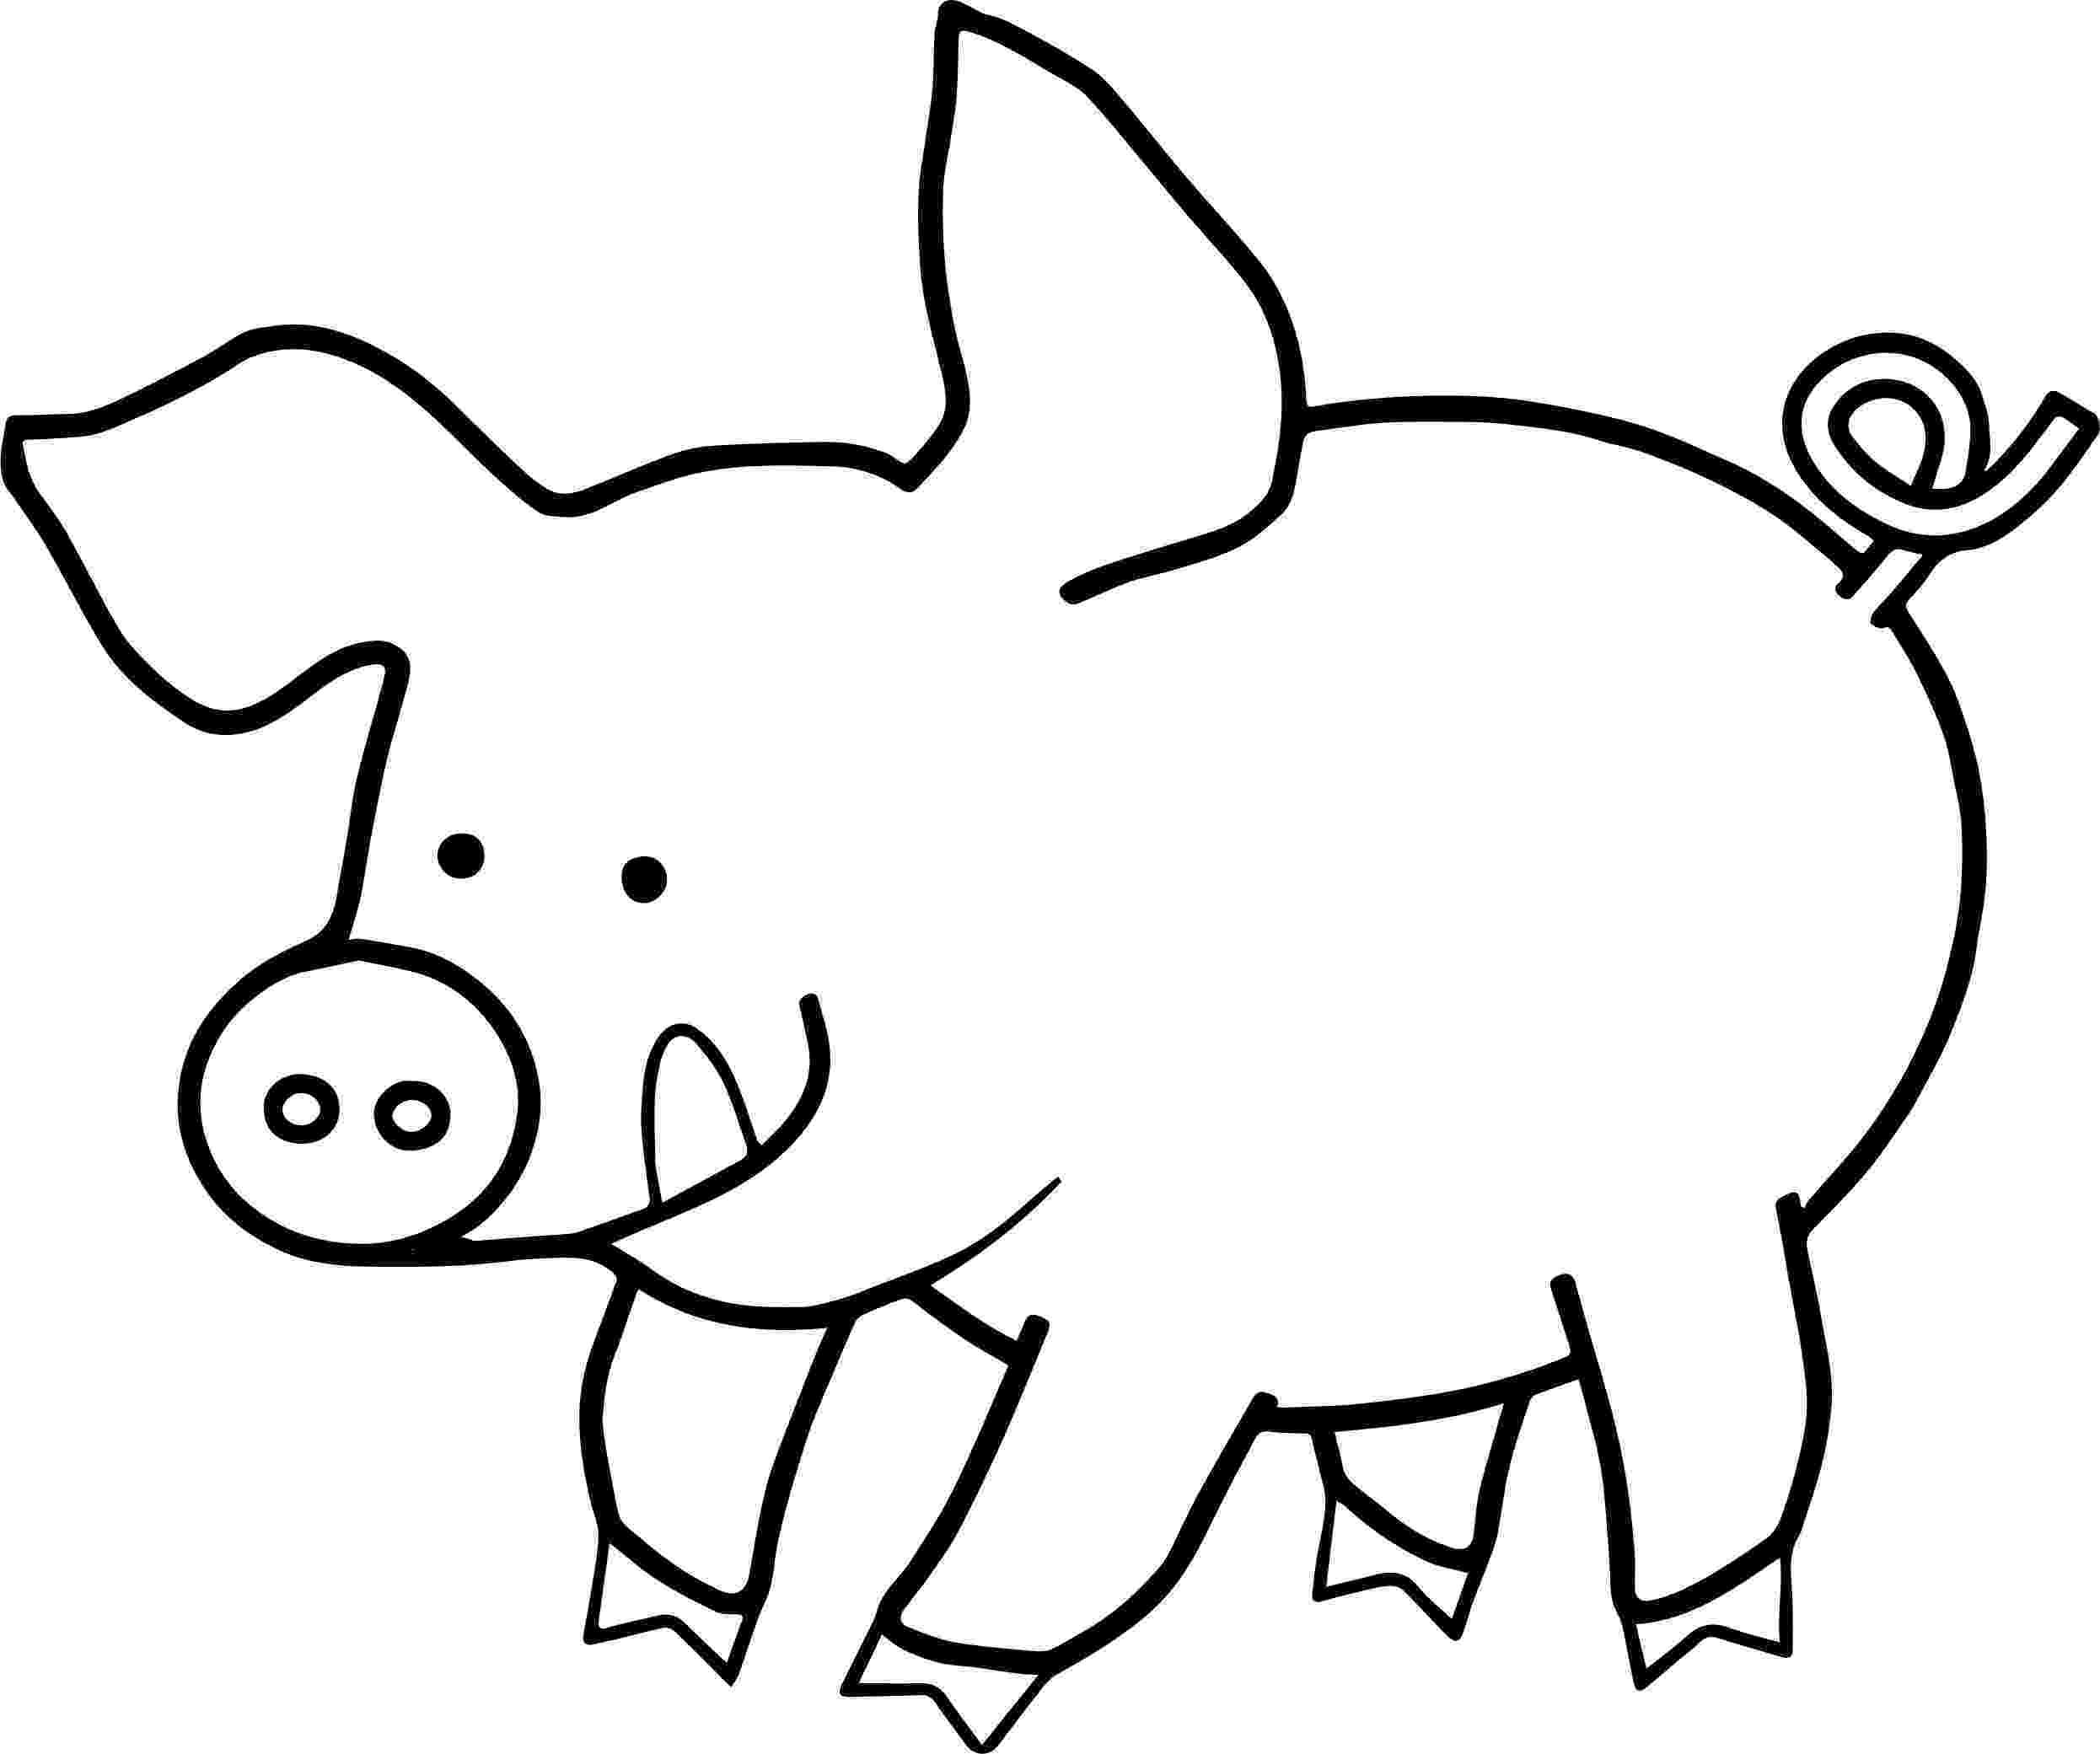 pig printable free printable pig coloring pages for kids cool2bkids printable pig 1 1